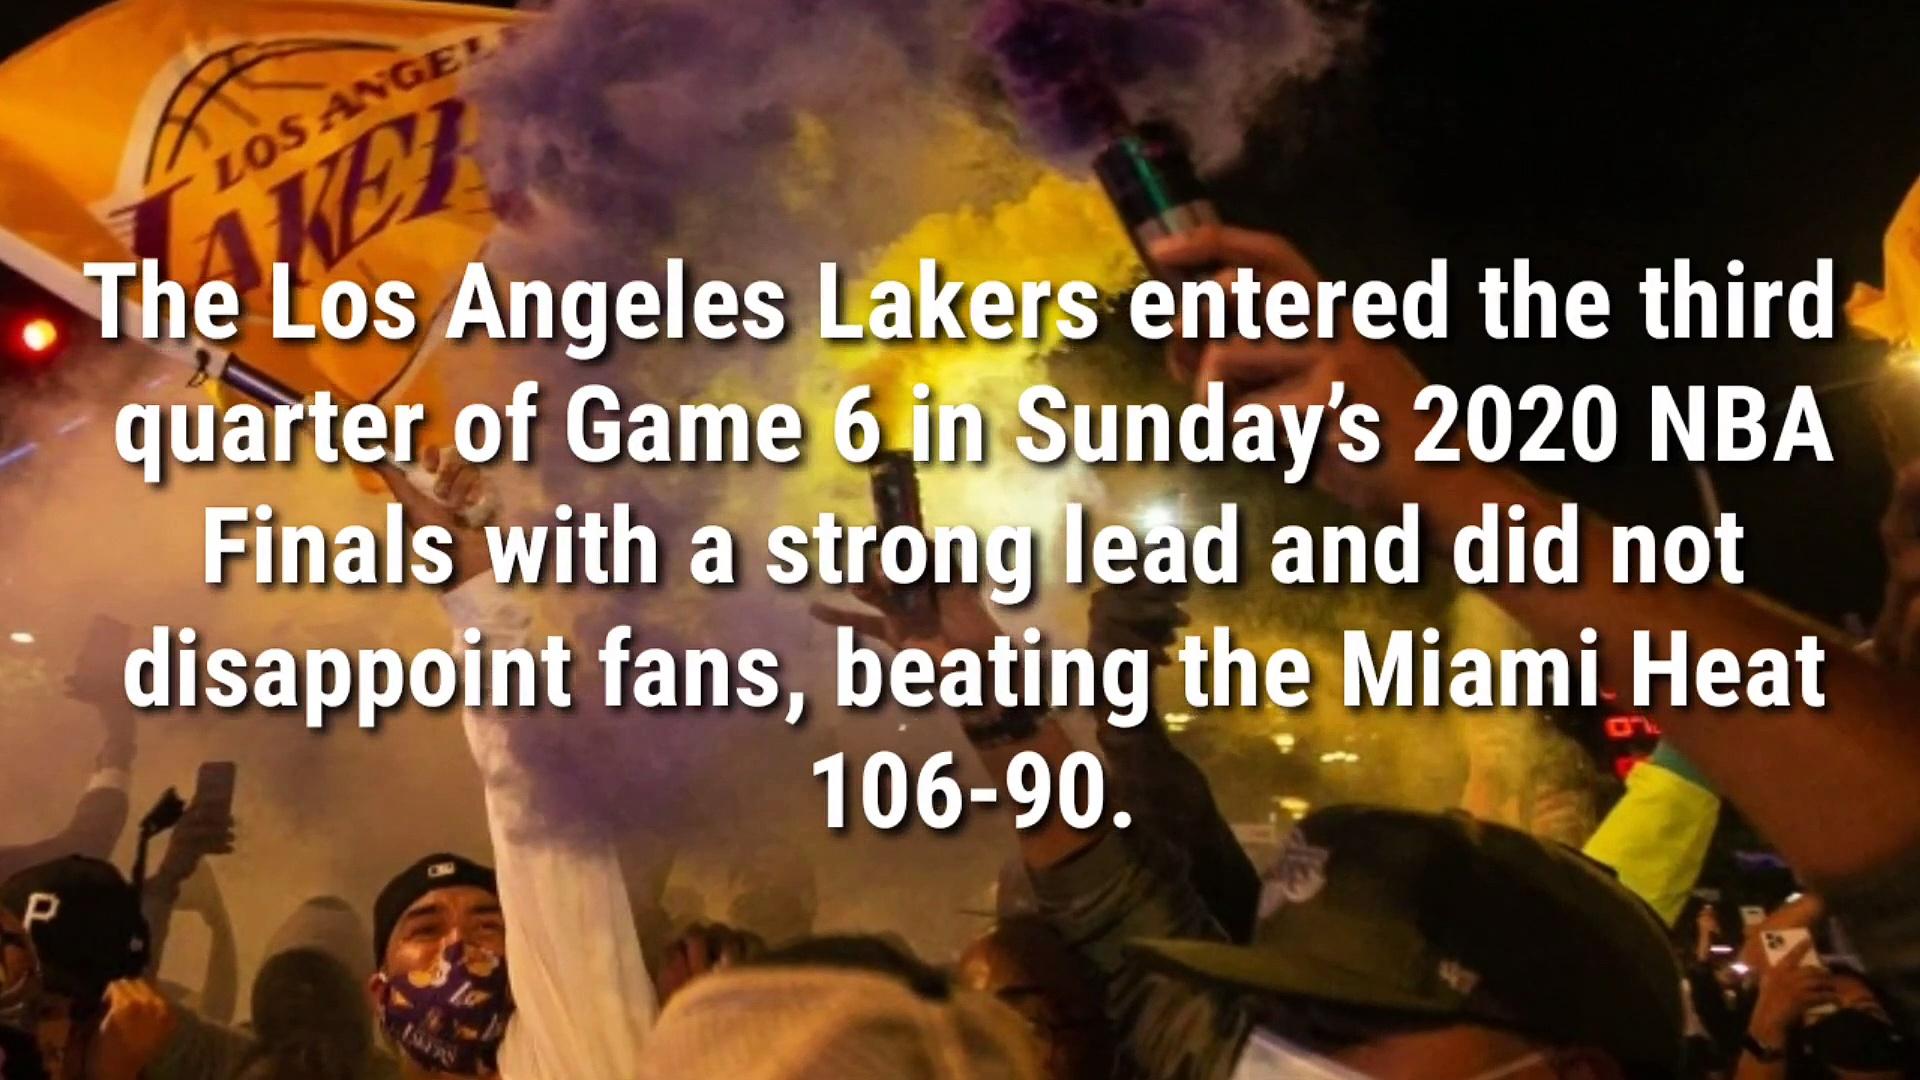 Lakers champion for kobe – Watch Lakers fans Celebrate NBA Finals in Street Chanting -Kobe-